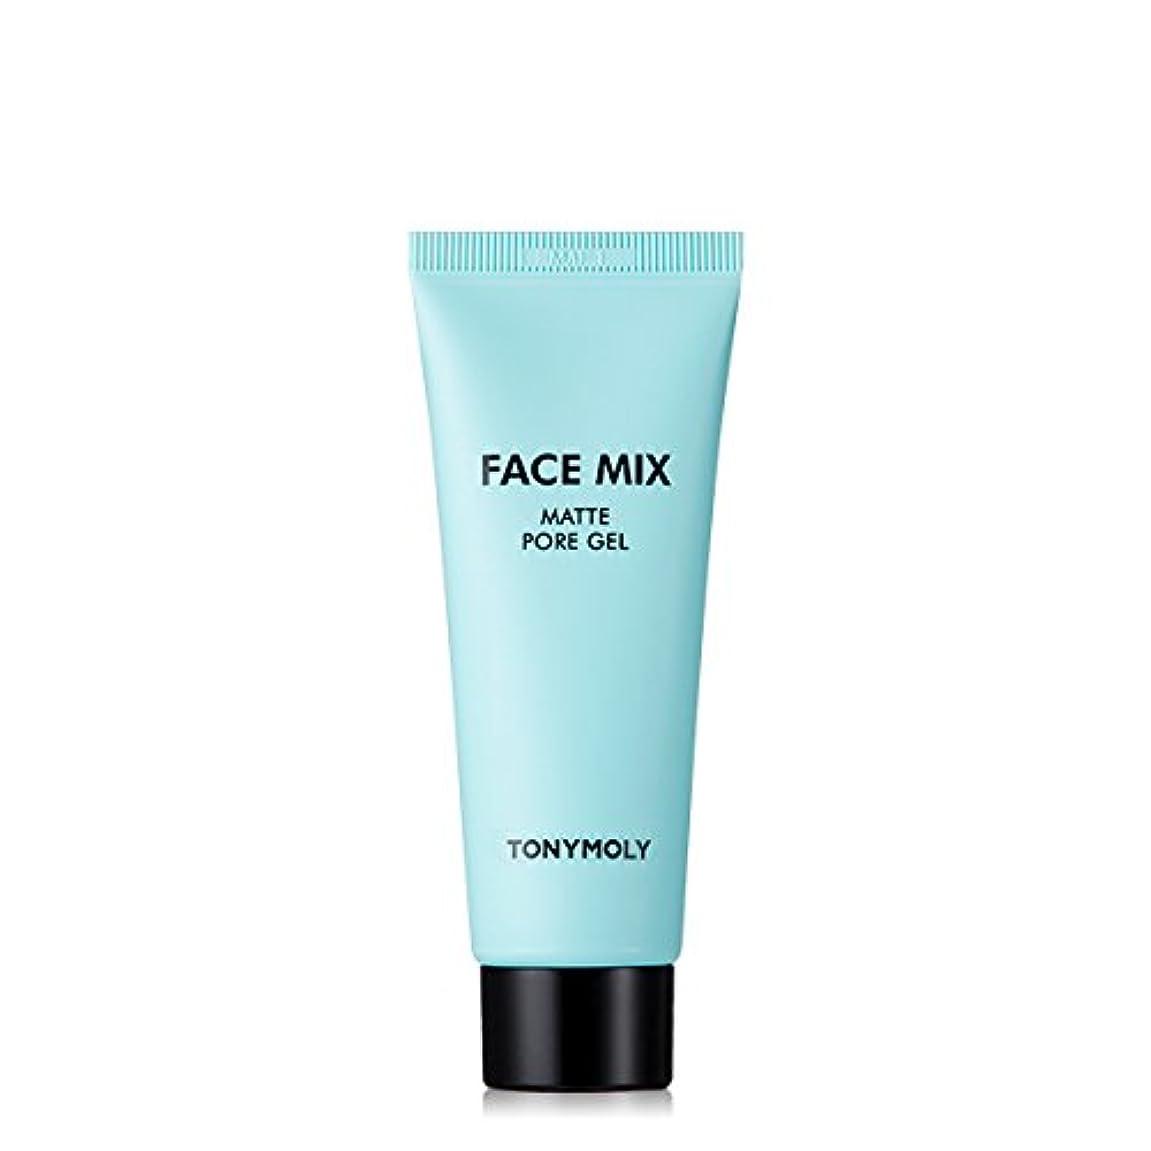 TONYMOLY Face Mix Matte Pore Gel トニーモリーフェースミックスマットポアジェル [並行輸入品]